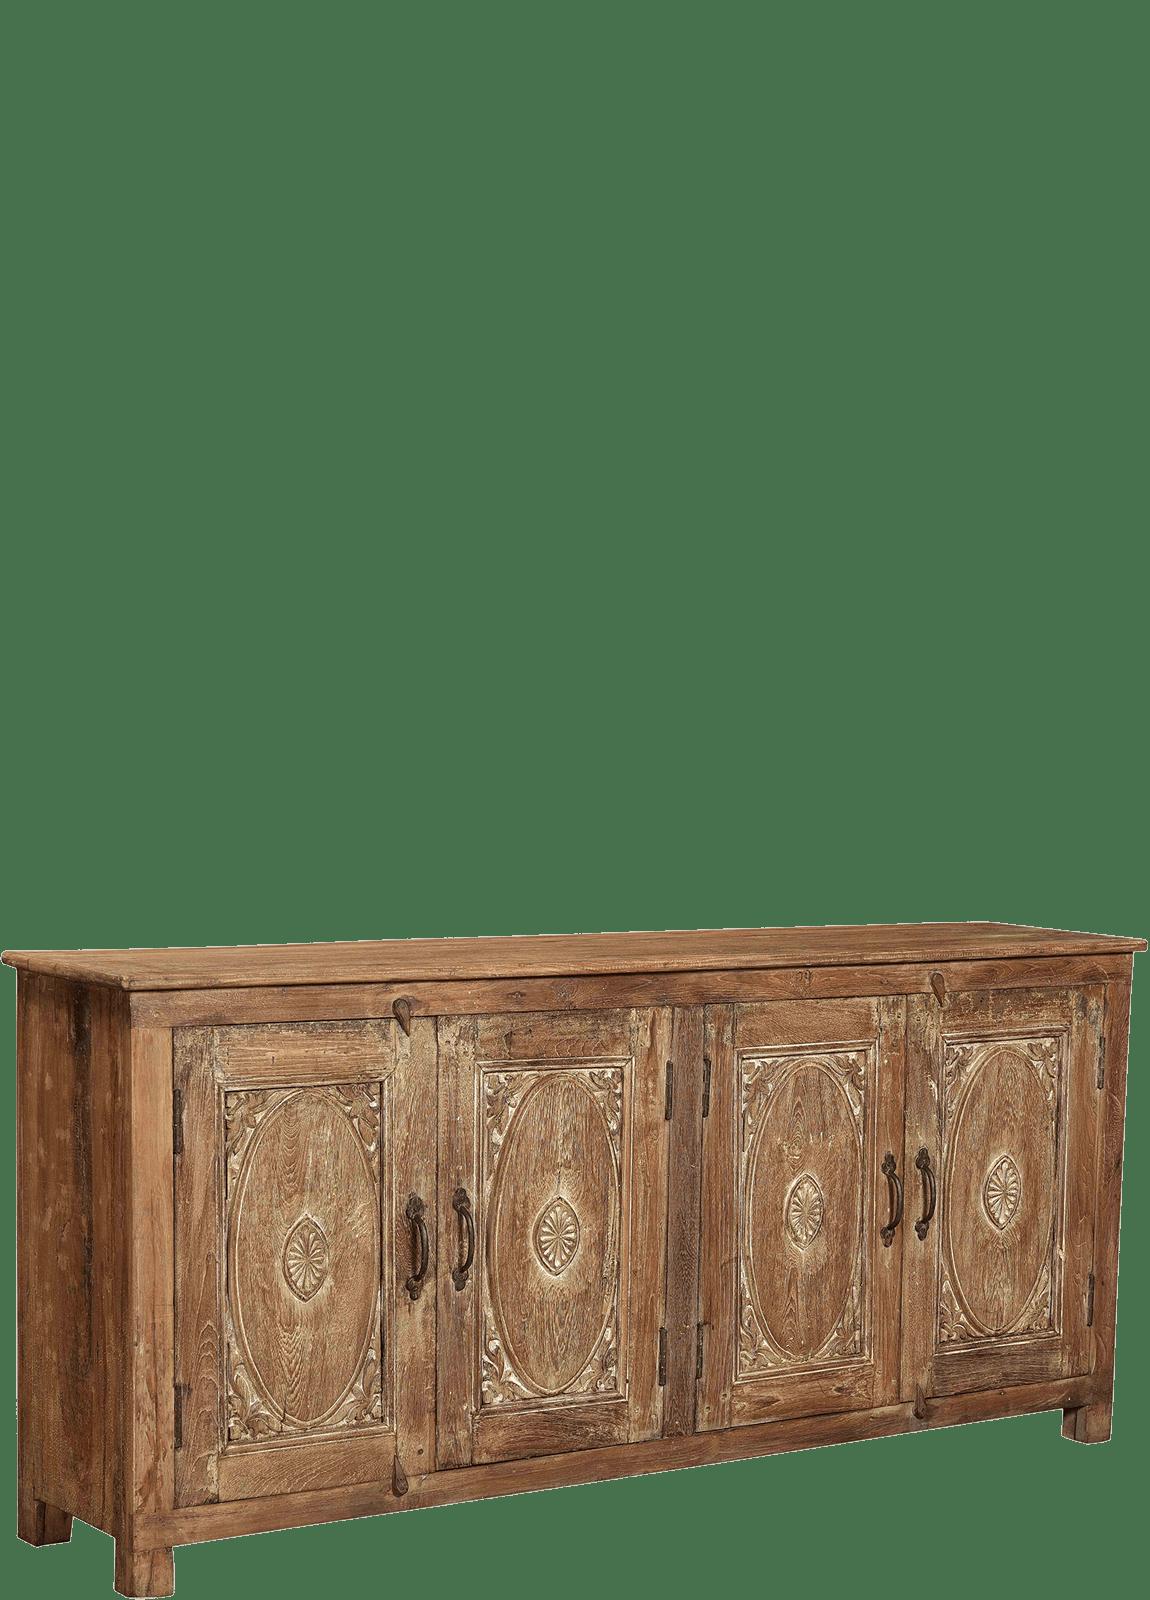 oud-dressoir-uit-india-oosterse-meubelen-indiase-meubels-bruin-natural-koreman-maastricht